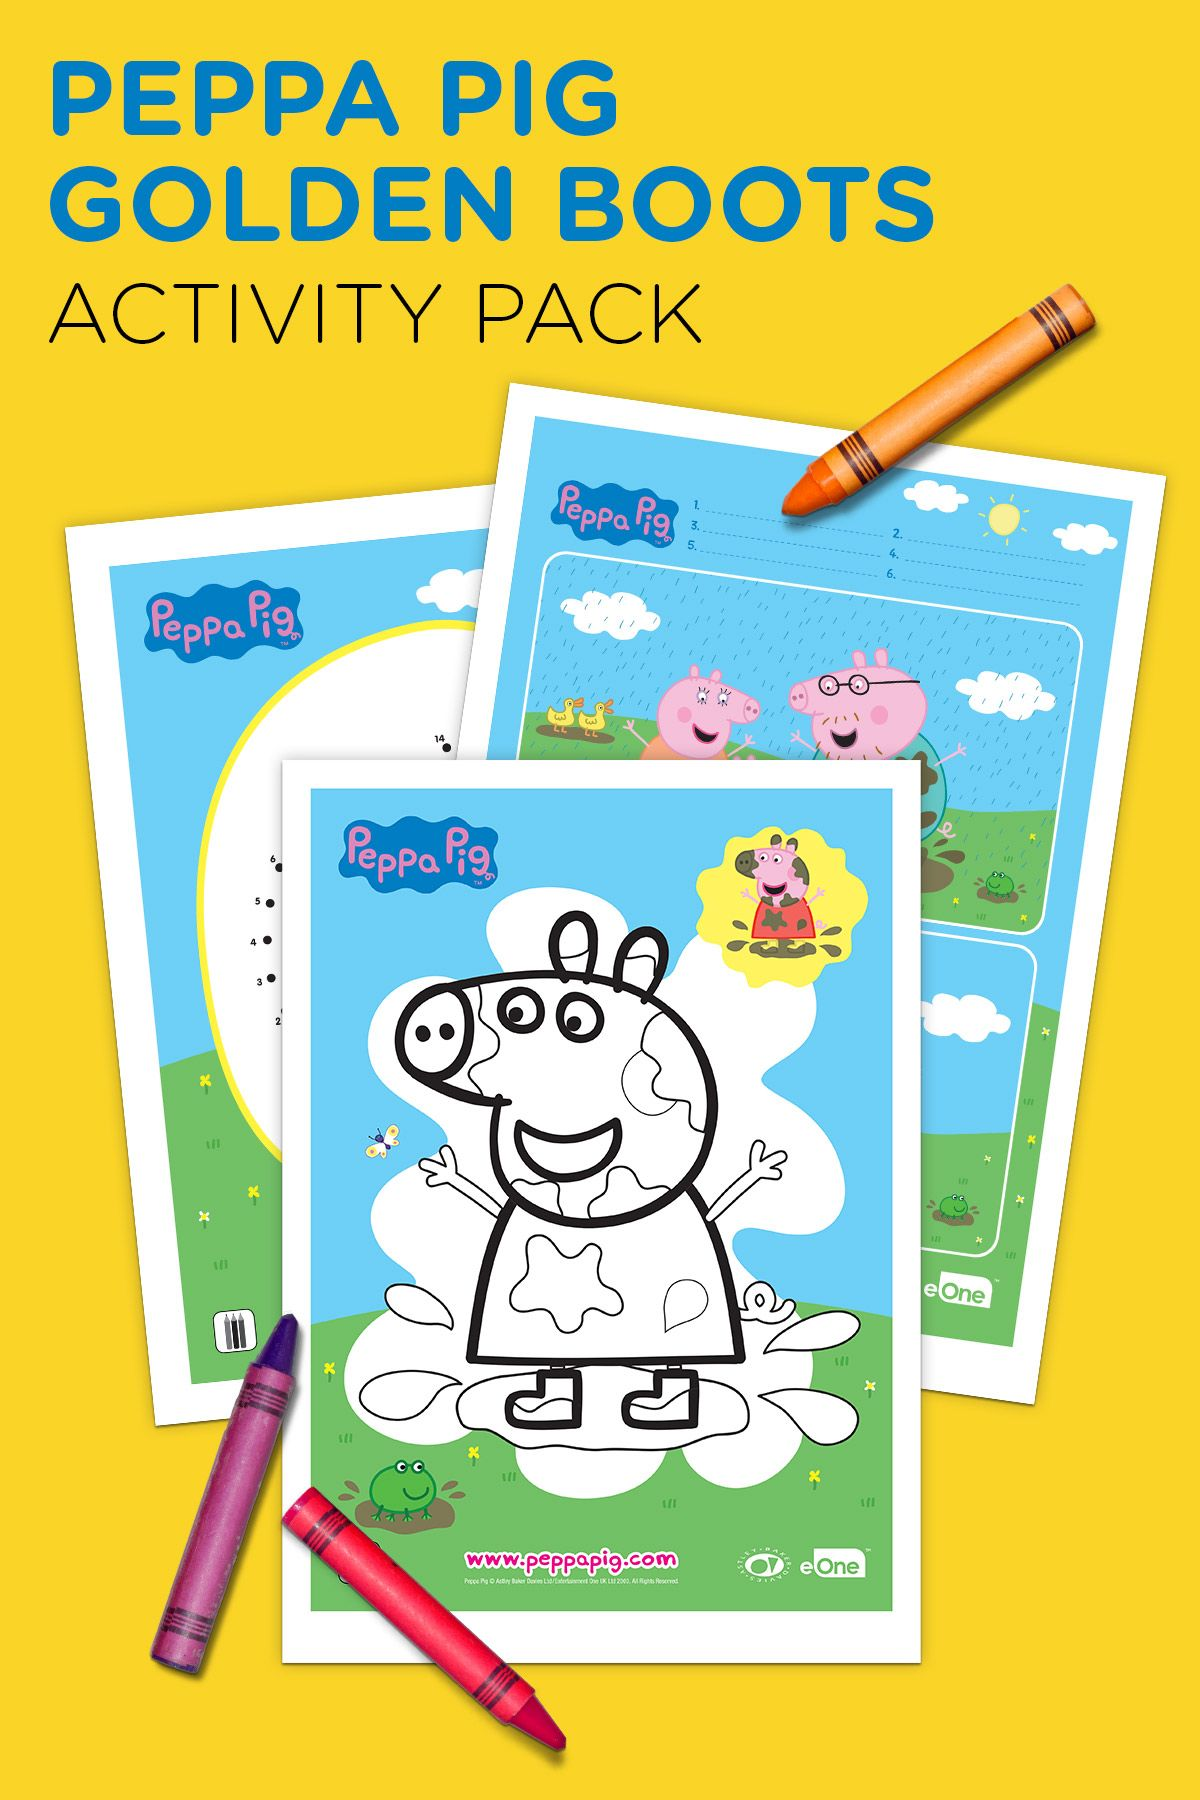 Peppa Pig Golden Boots Activity Pack